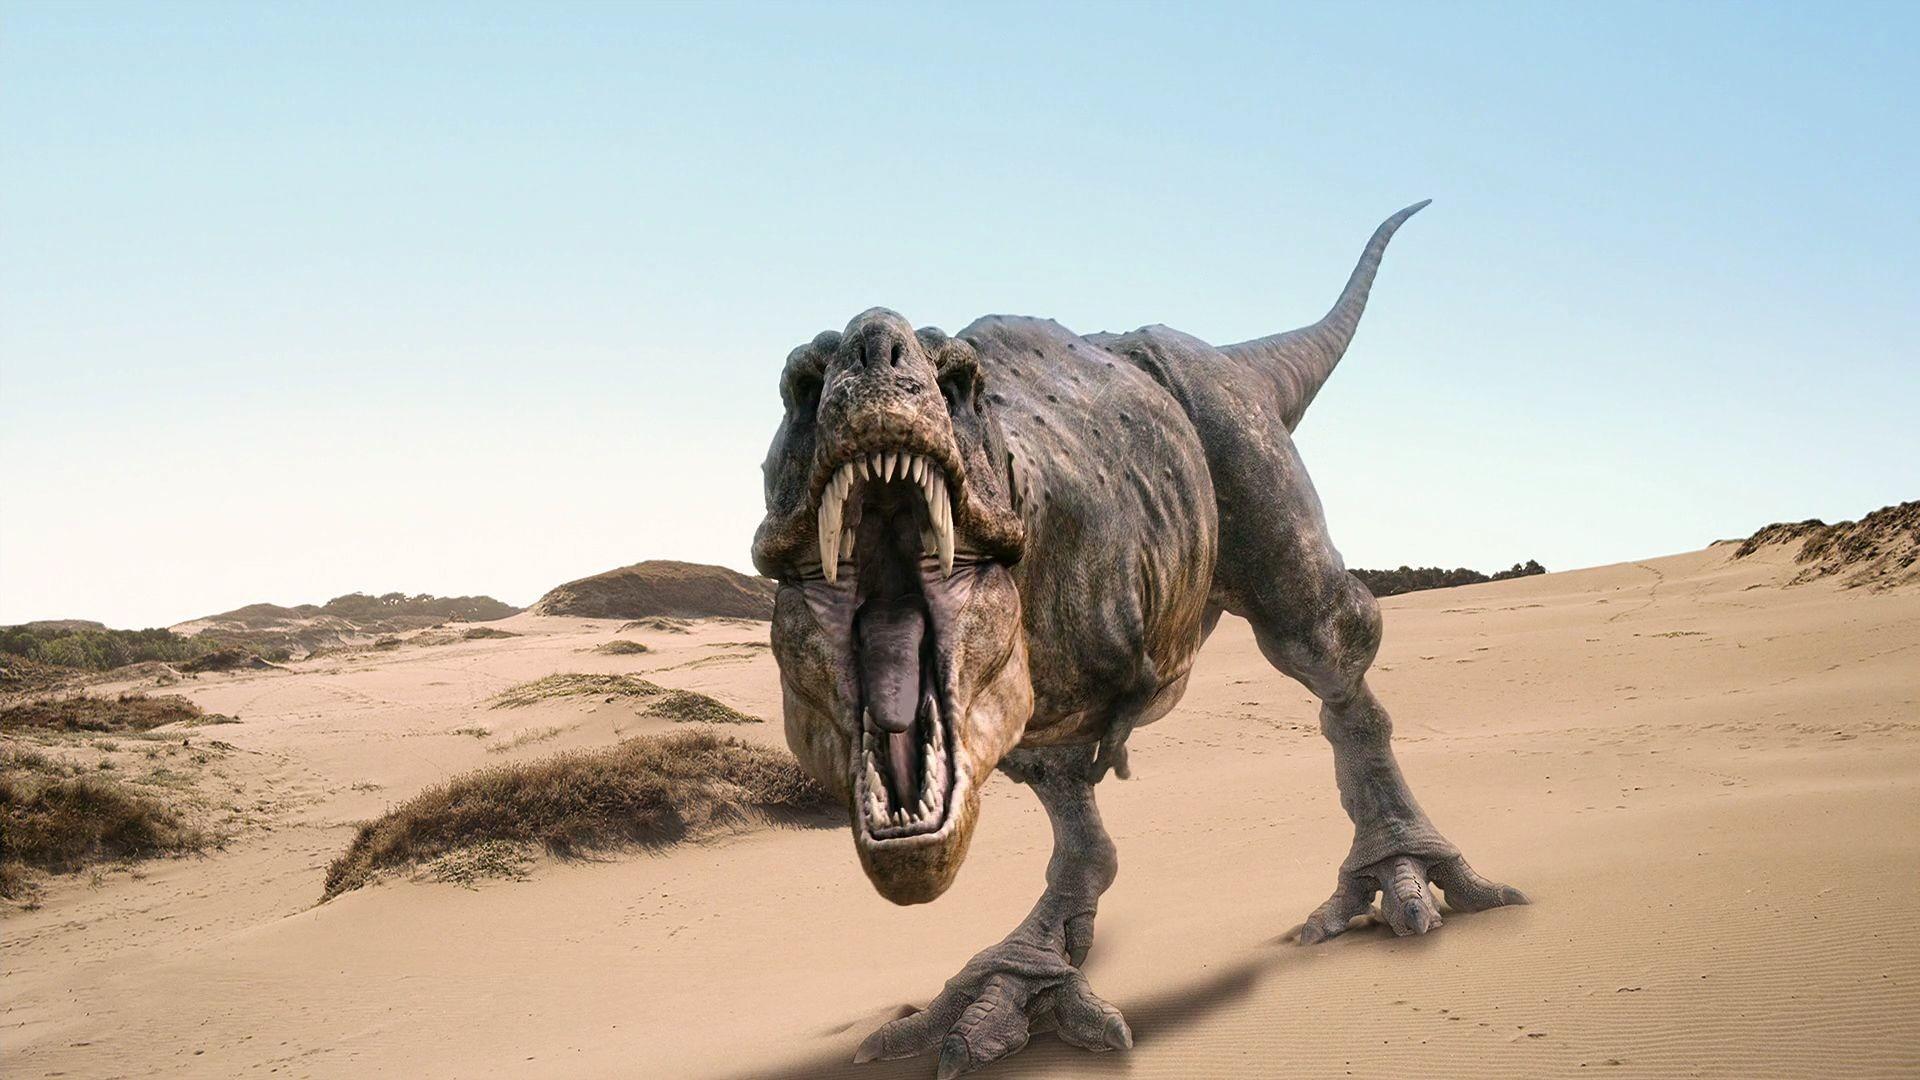 Res: 1920x1080, T-Rex Dinosaurs HD Desktop Wallpaper